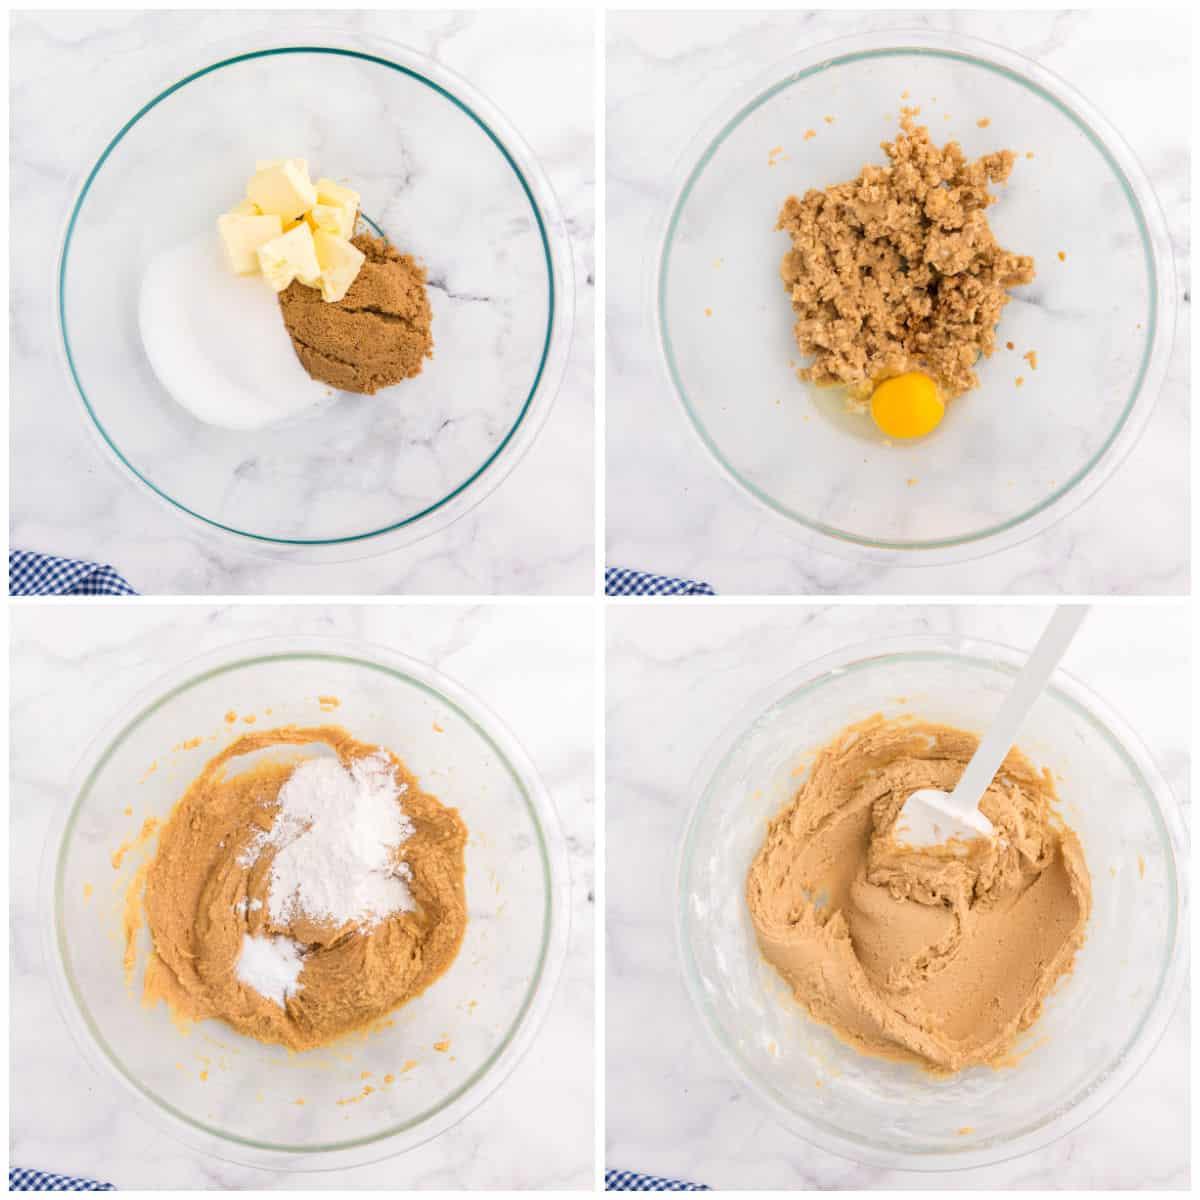 Peanut Butter Cookies prep